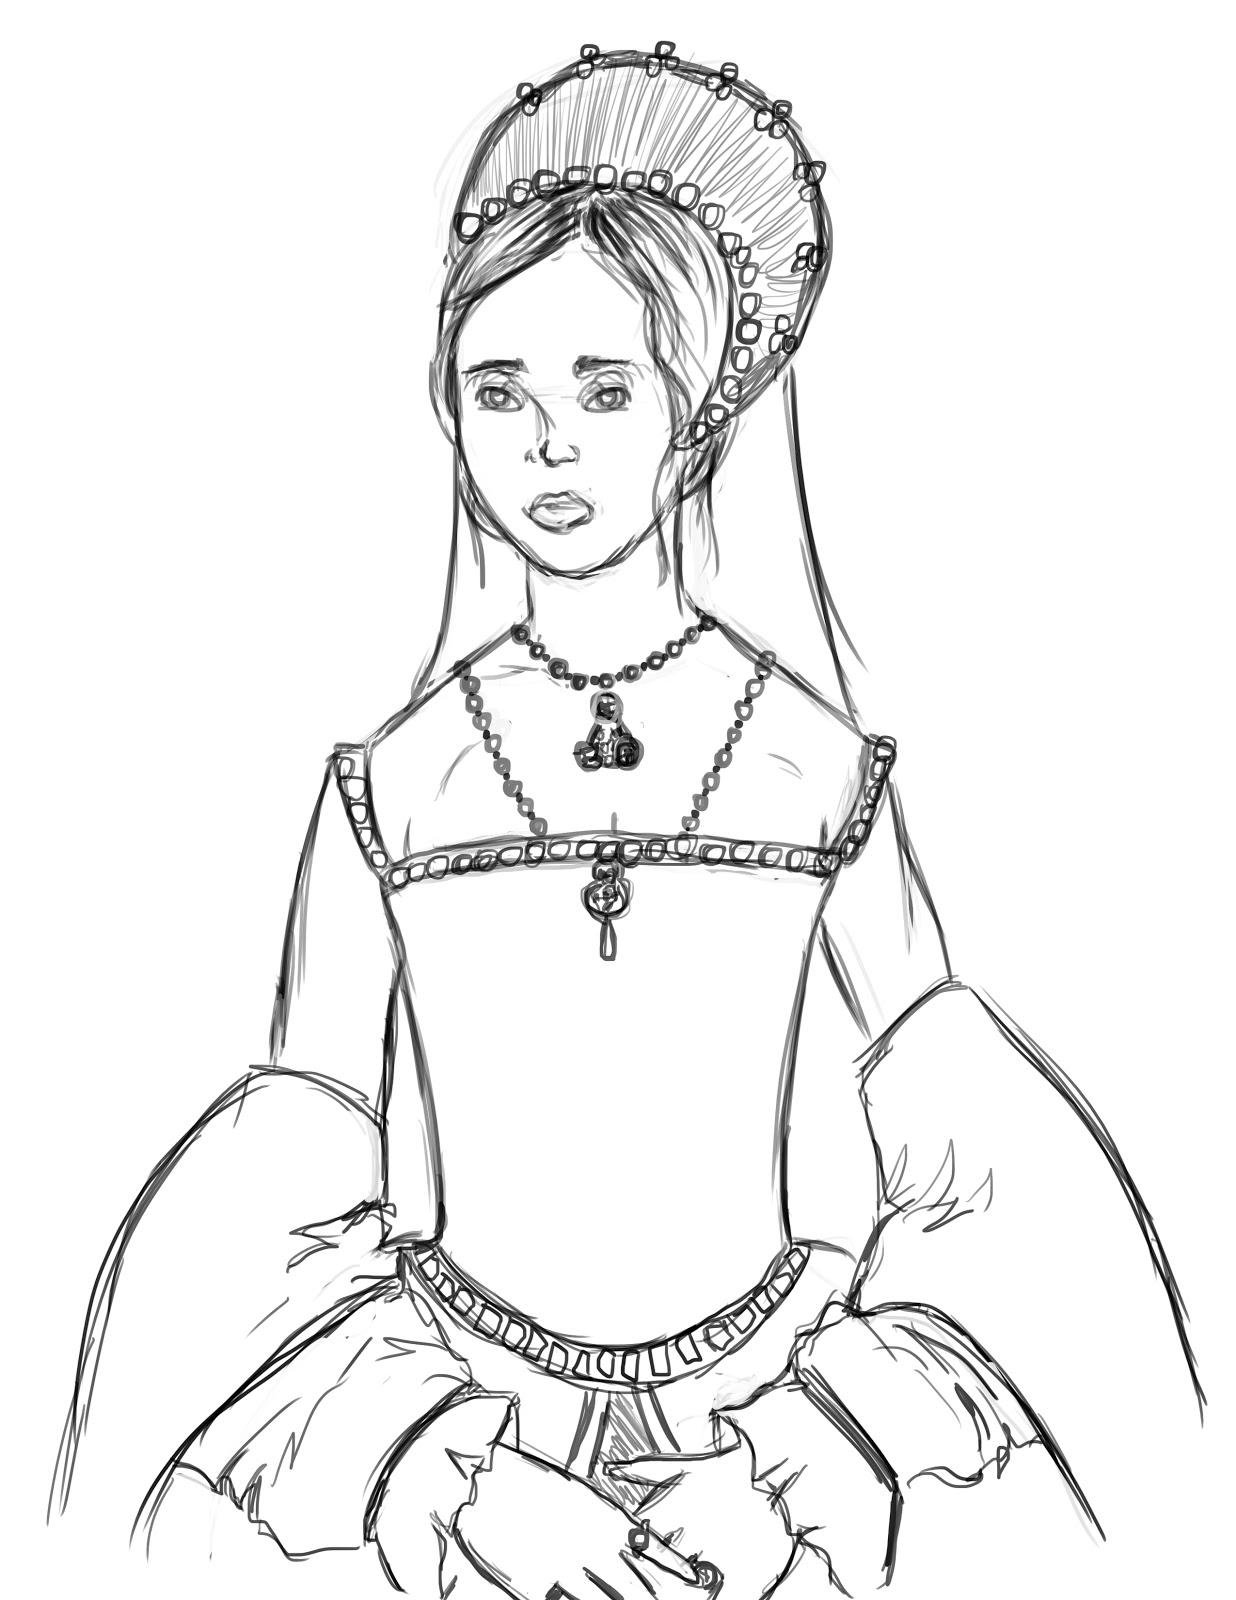 1236x1600 Queen Mary I Of England, The Sketch. Caeleigh Girard